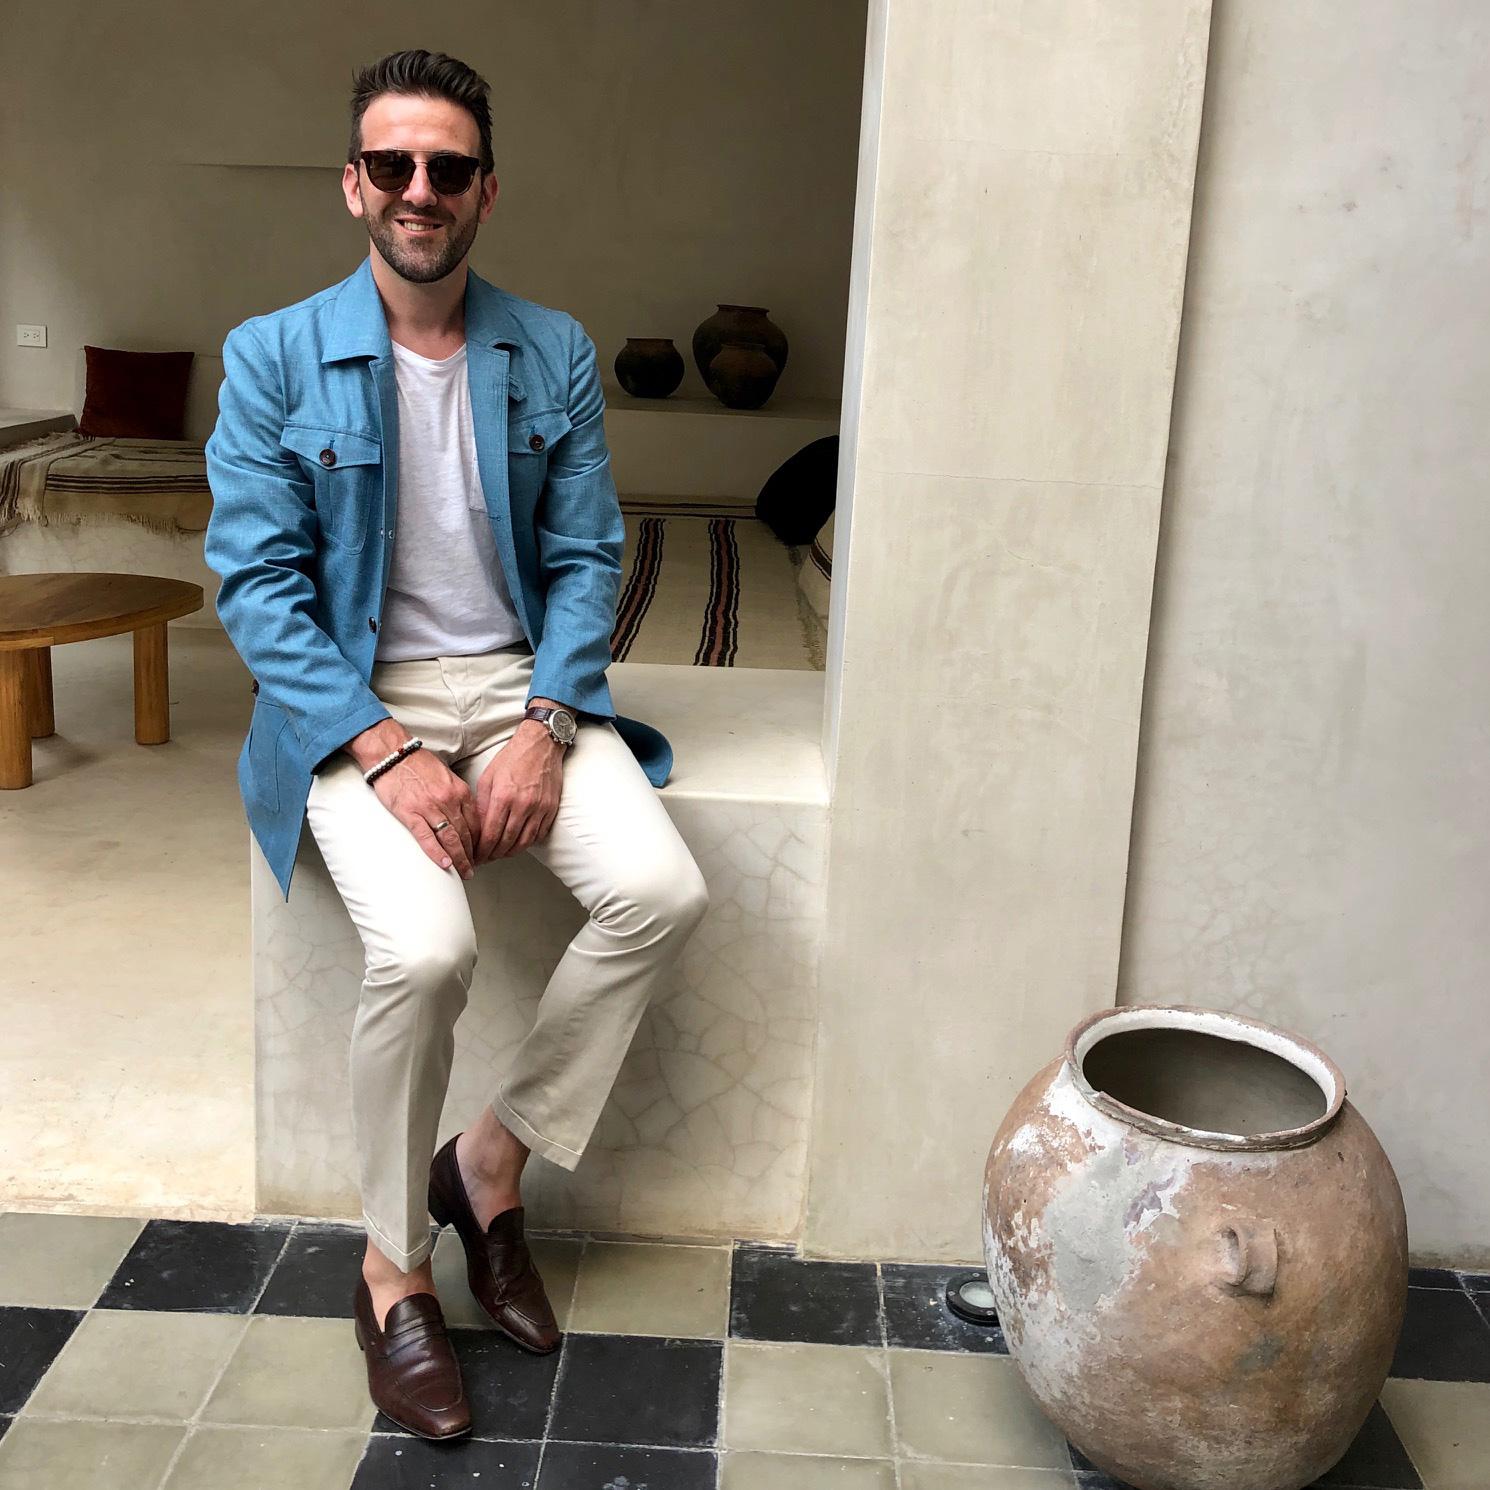 Carl Nave Tailored Tulum Turquoise Blazer Cotton Bespoke Chinos